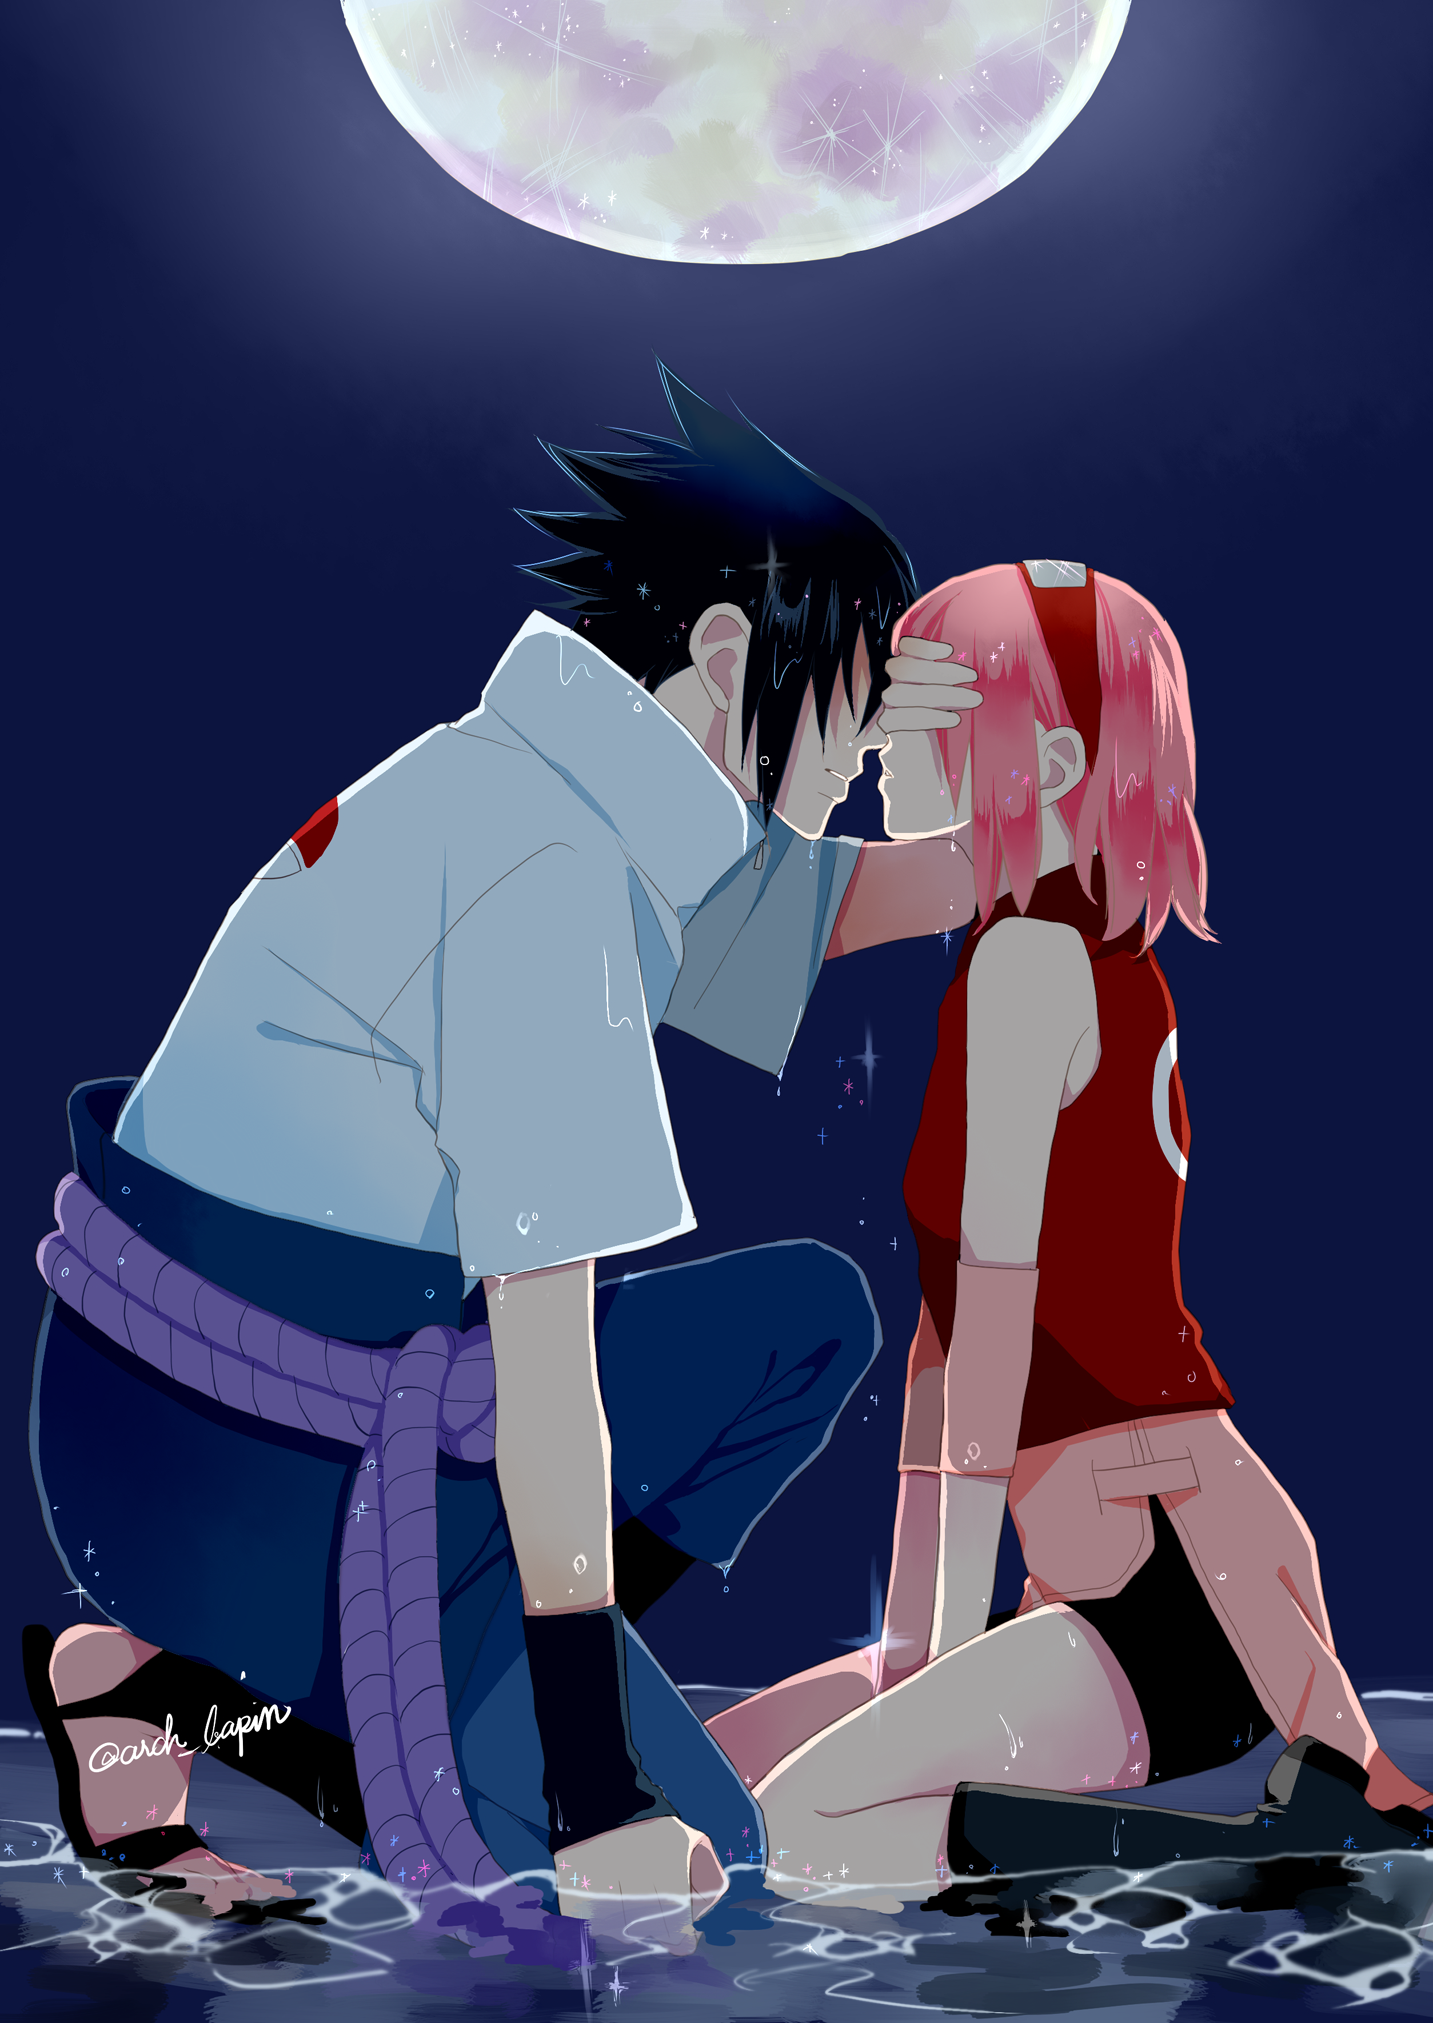 Sasuke almost kiss sakura